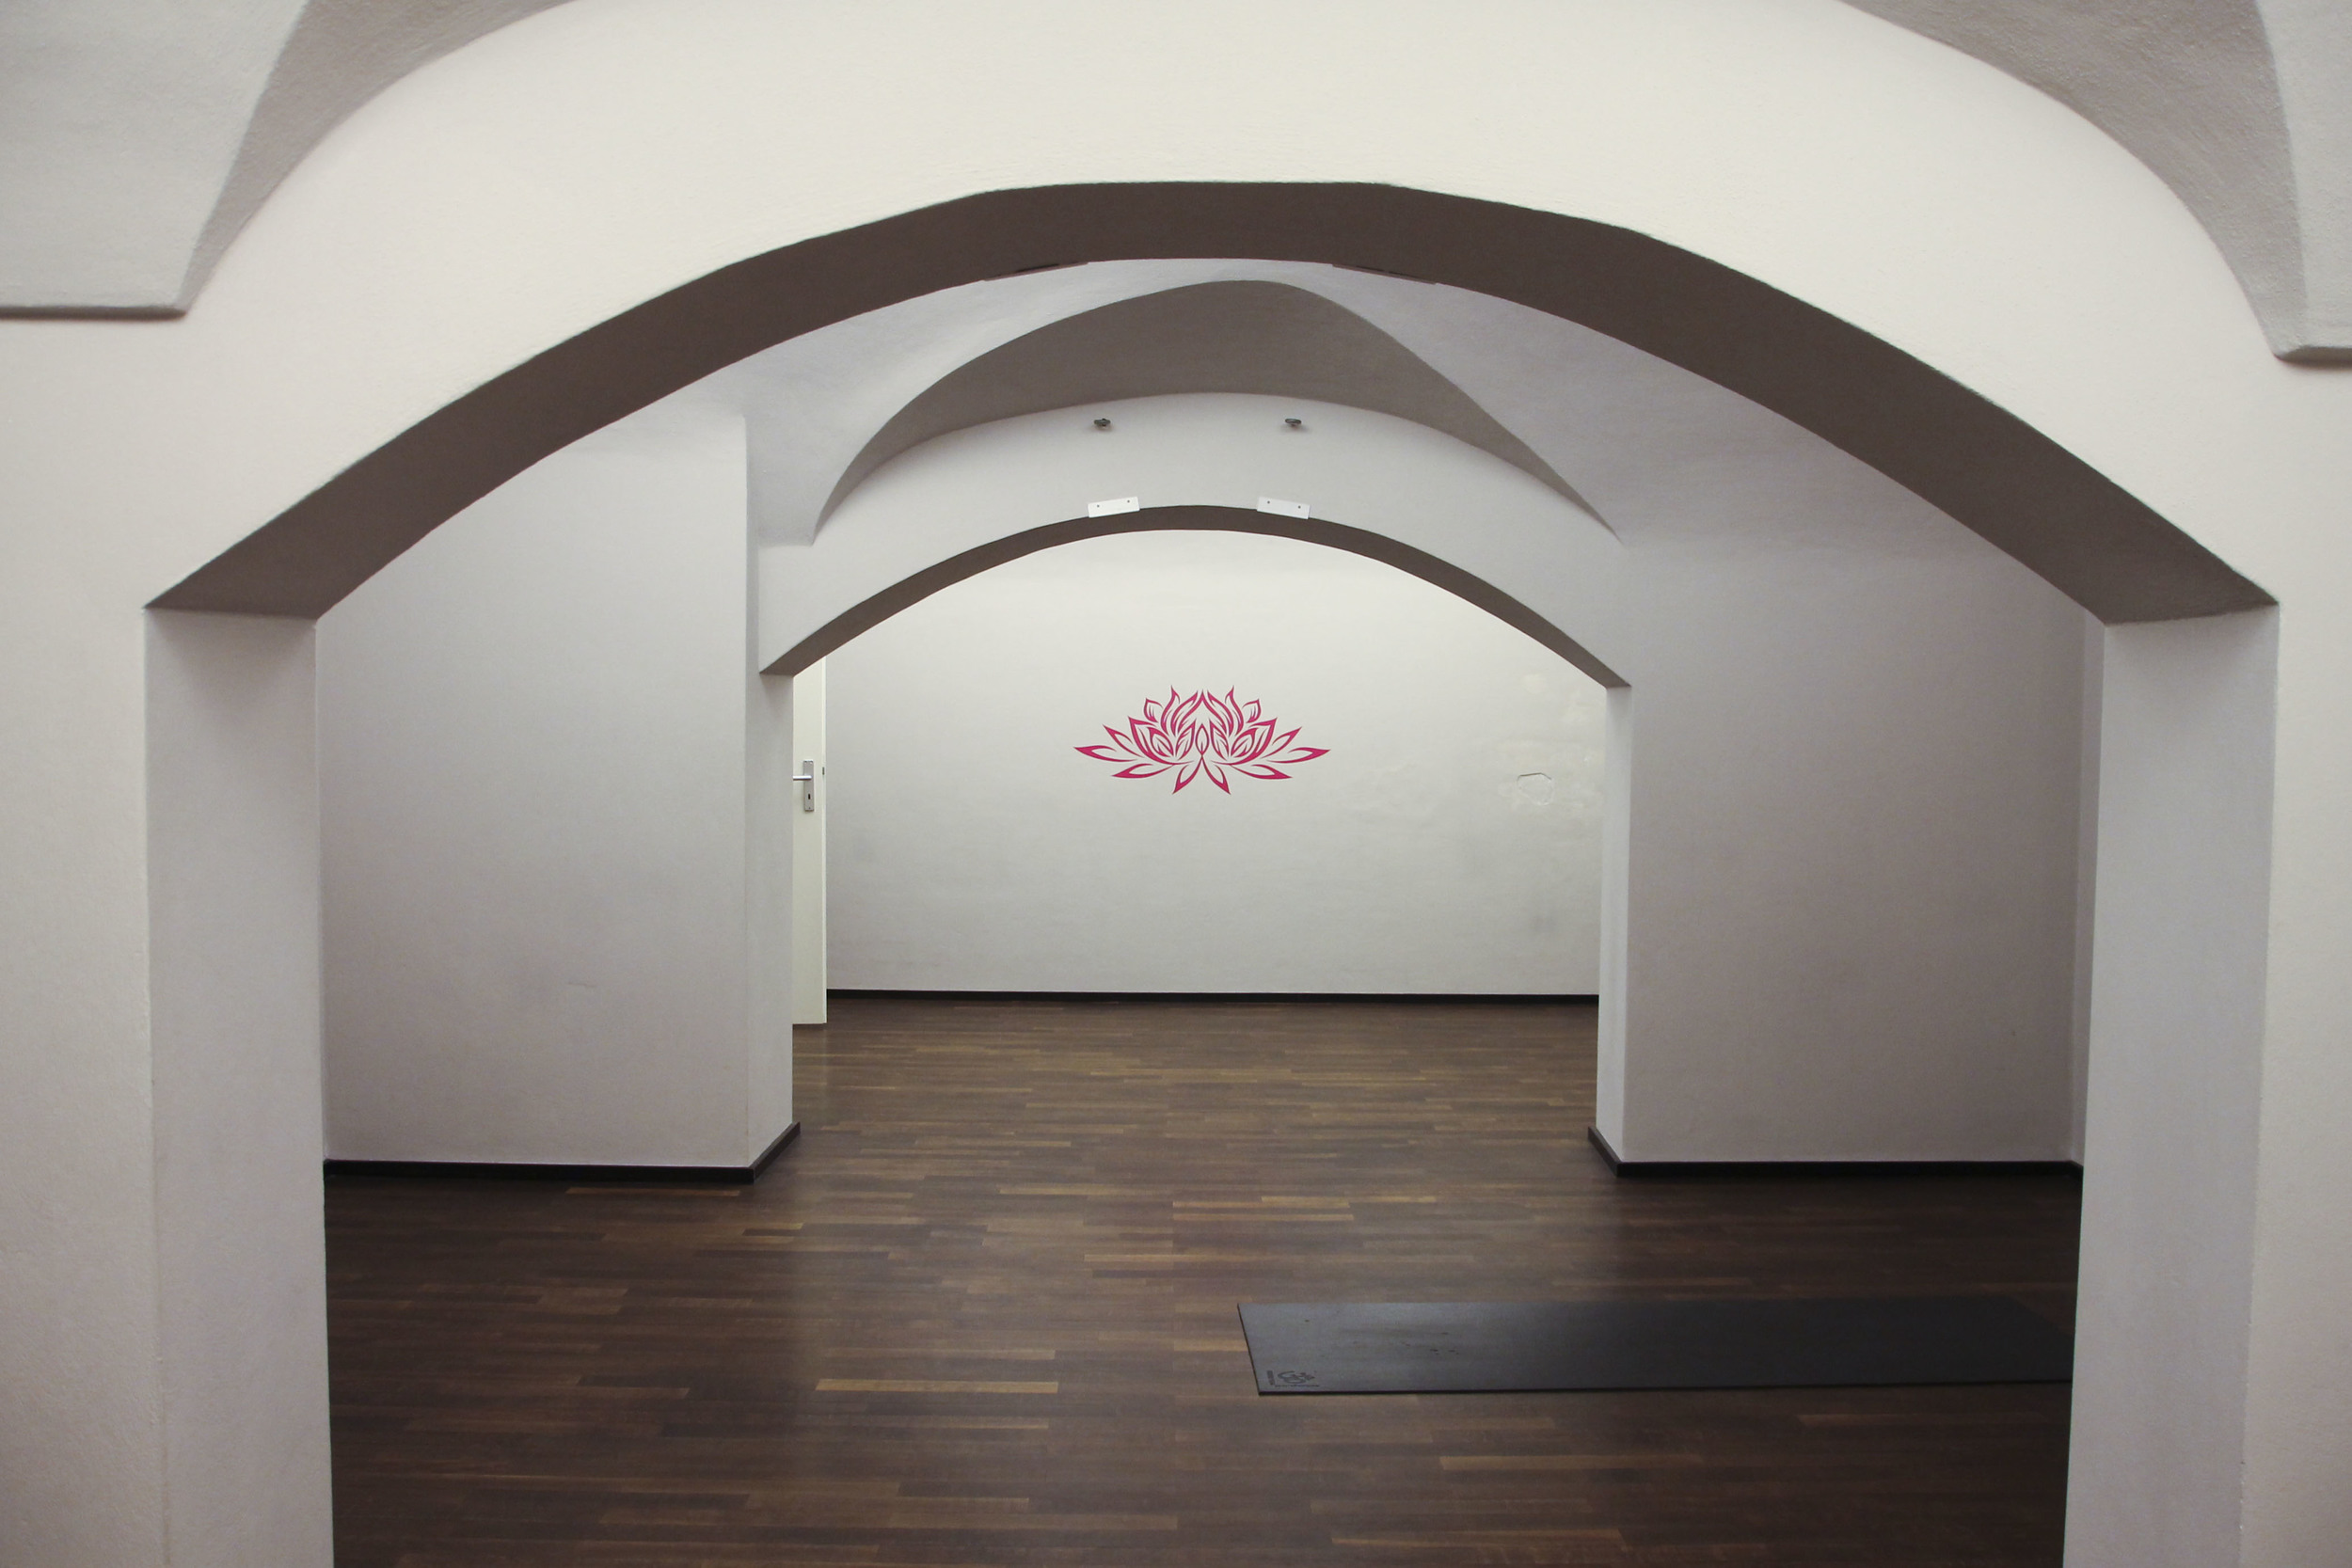 yoga studio werkstatt7 München763.jpg